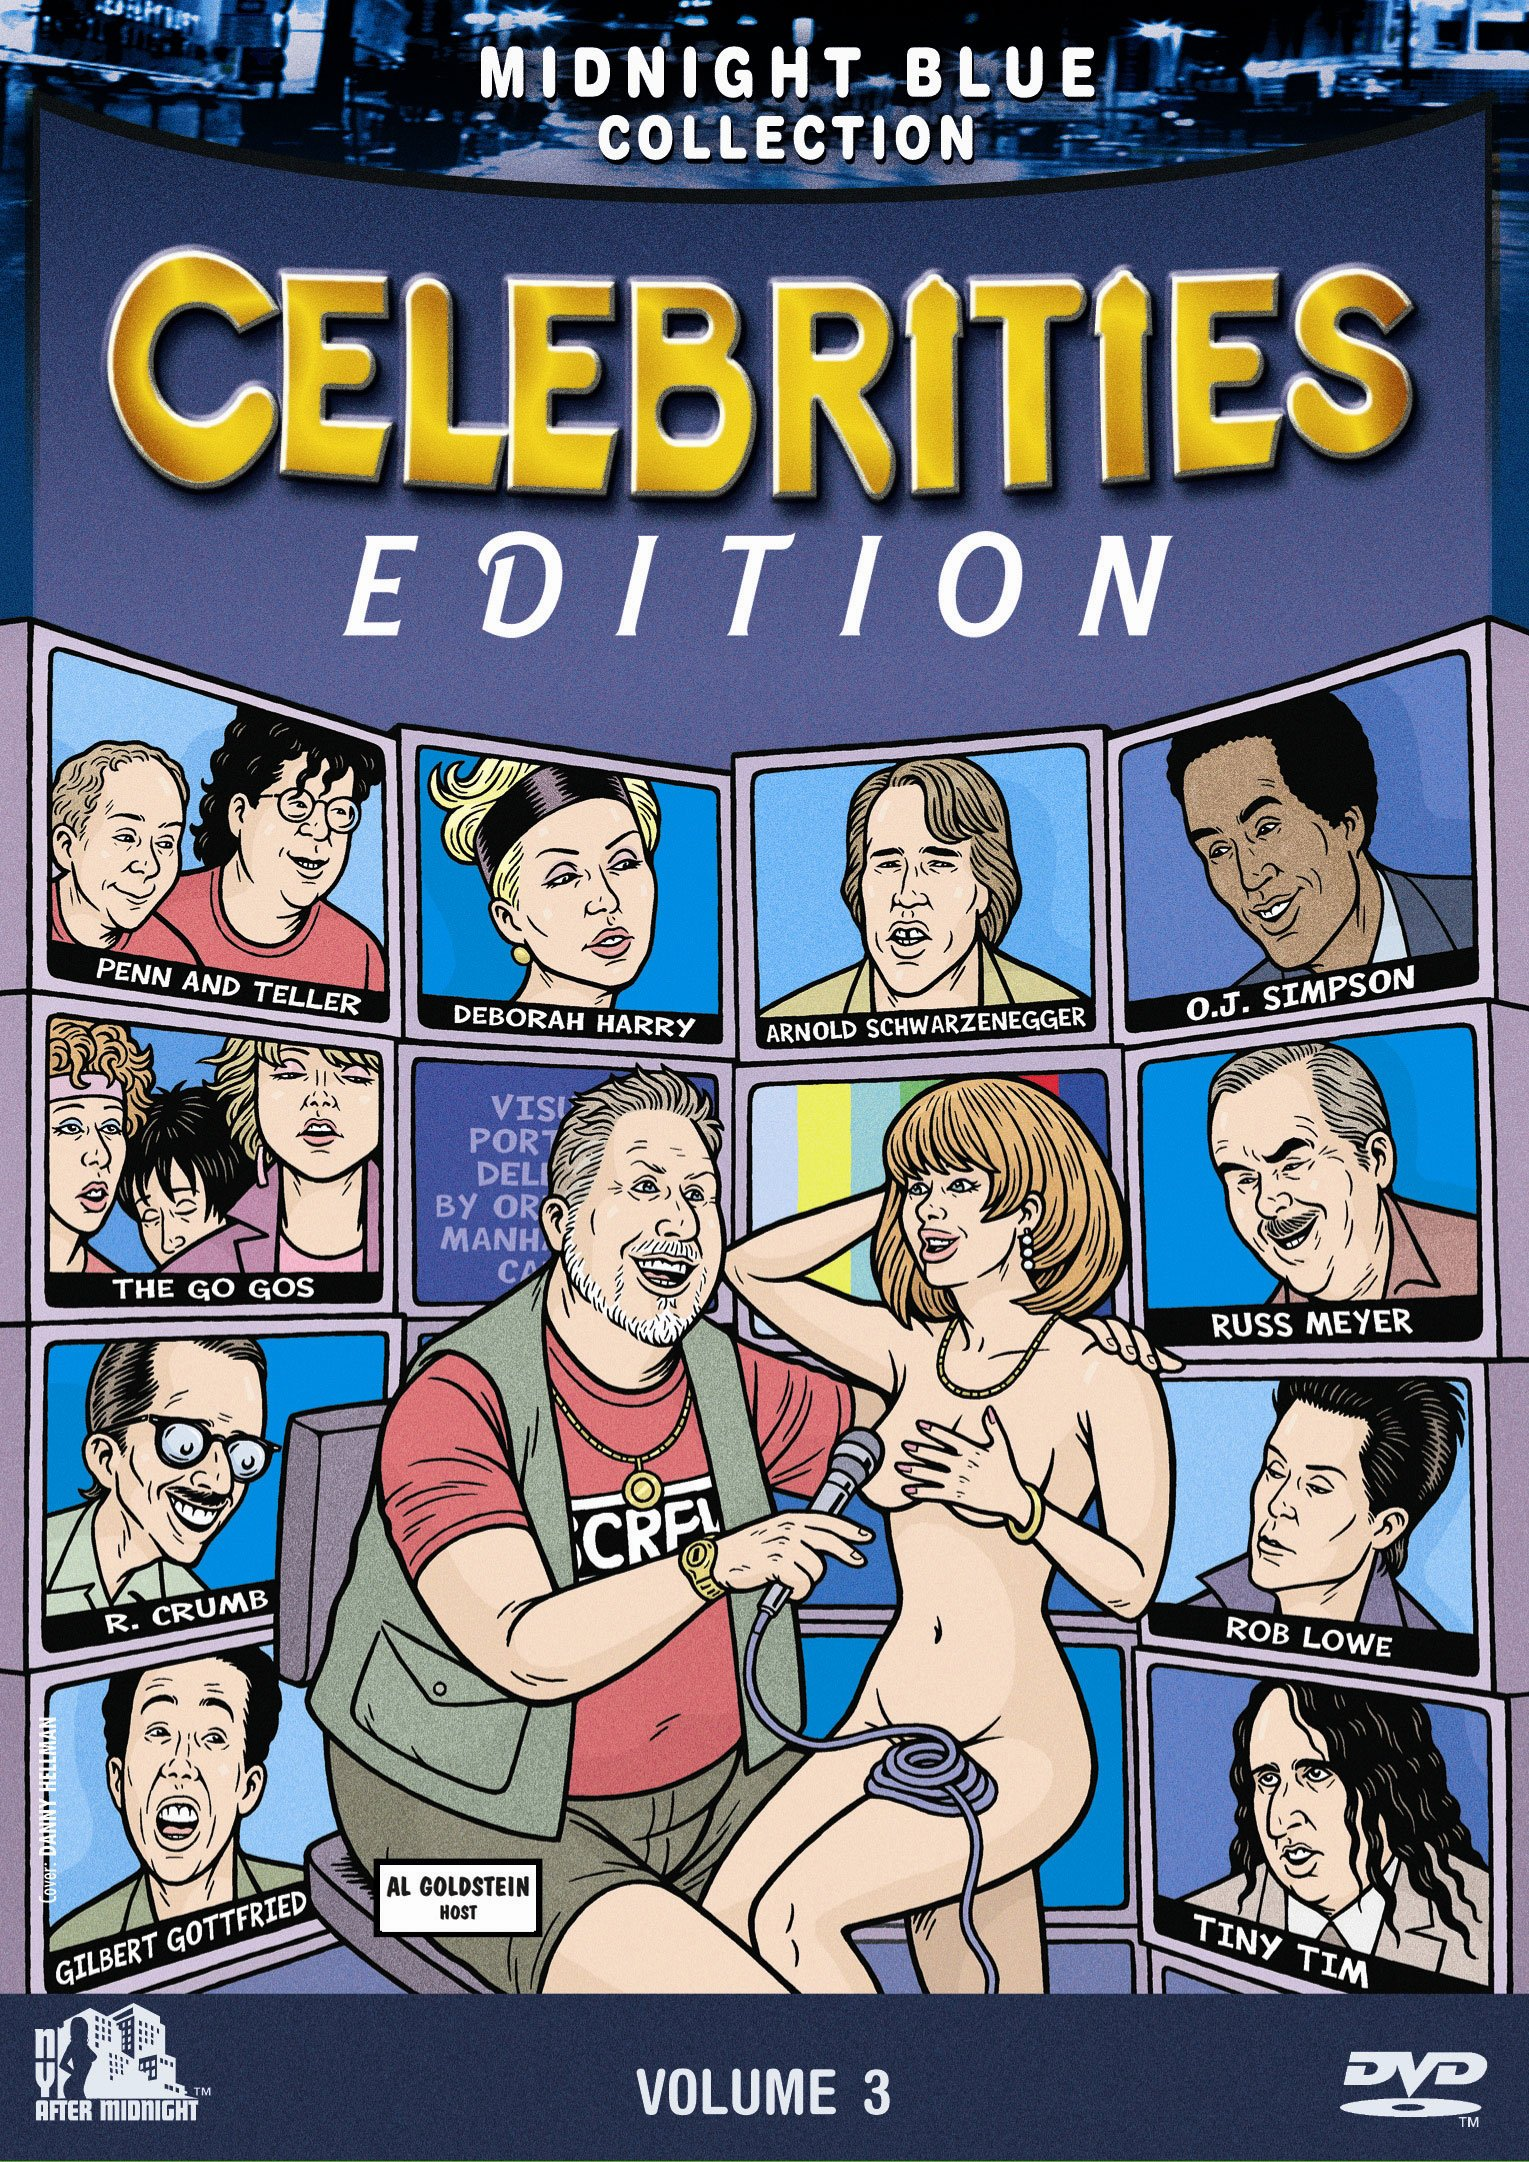 Midnight Blue Collection Volume 3: Celebrities Edition